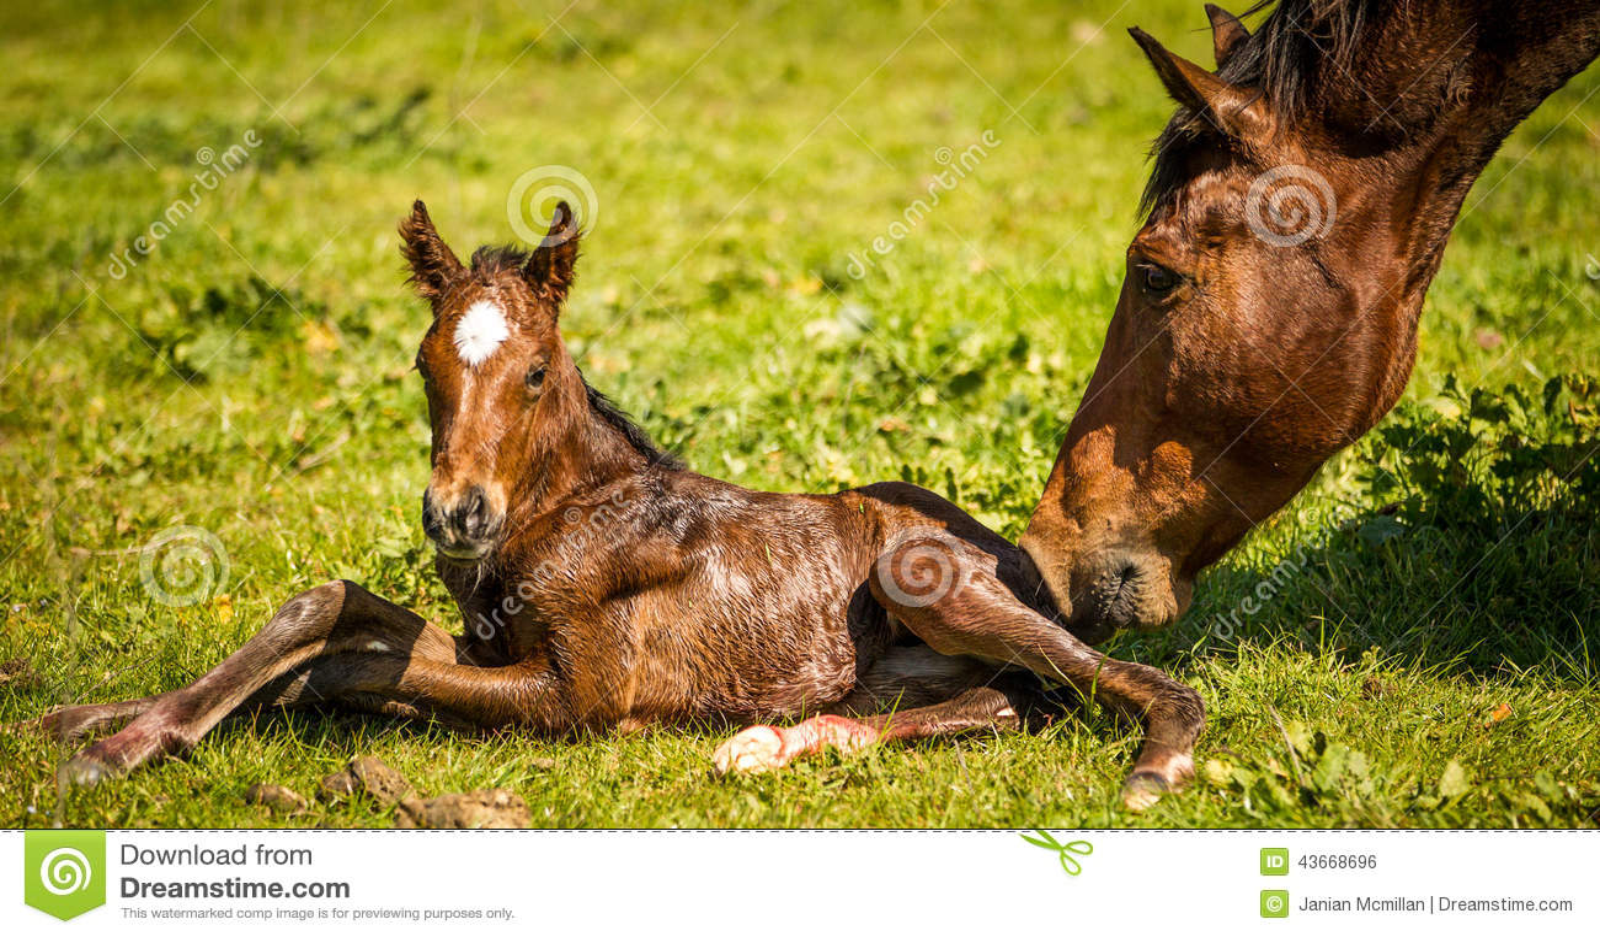 Thoroughbred broodmare greeting her newborn foal